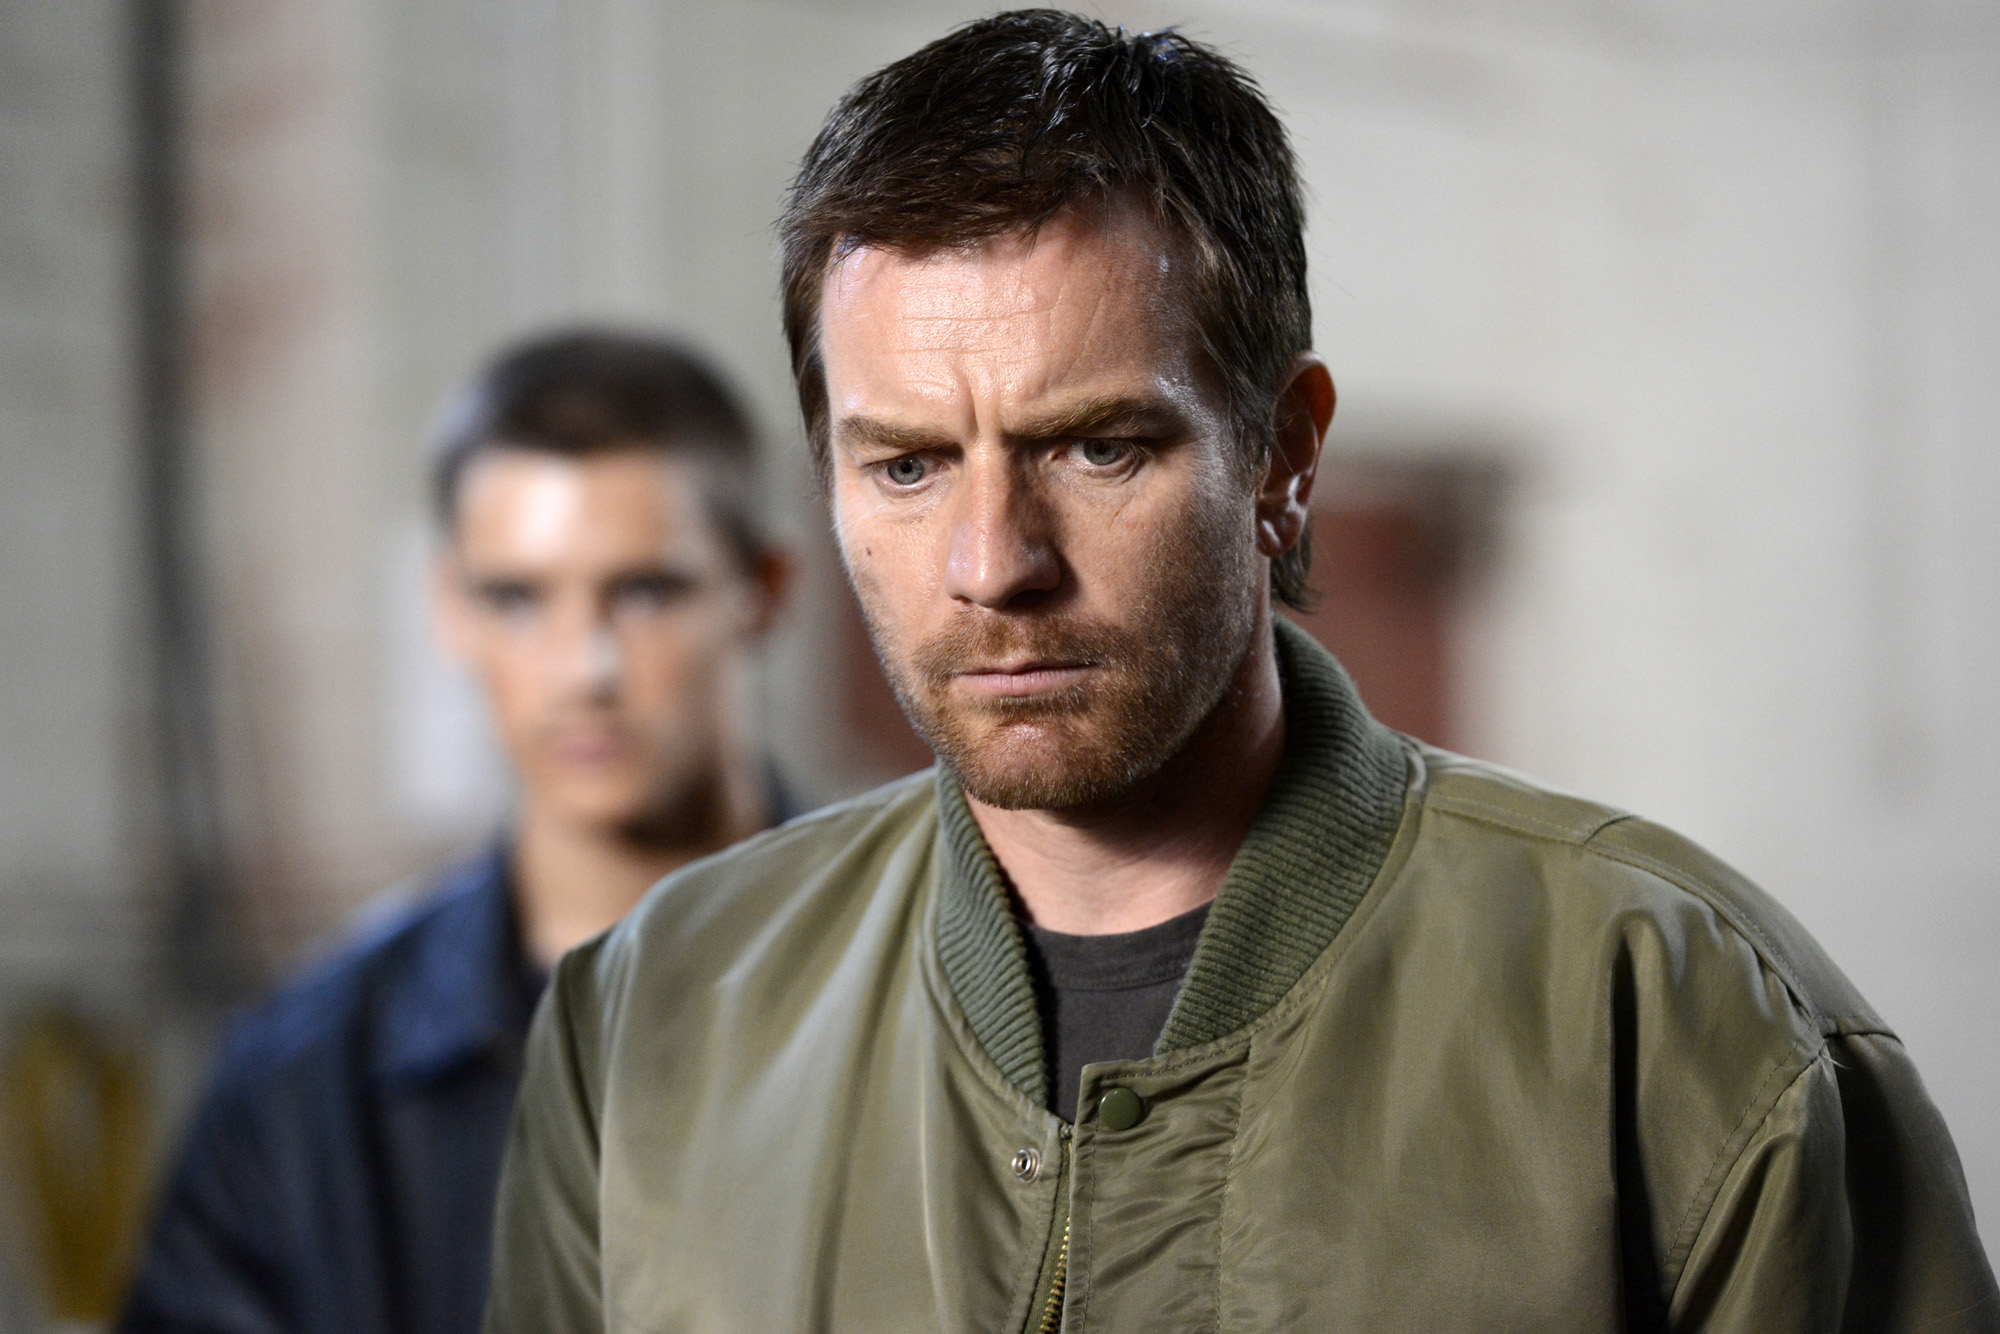 New Ewan Mcgregor Film Son Of A Gun Is Firing Blanks